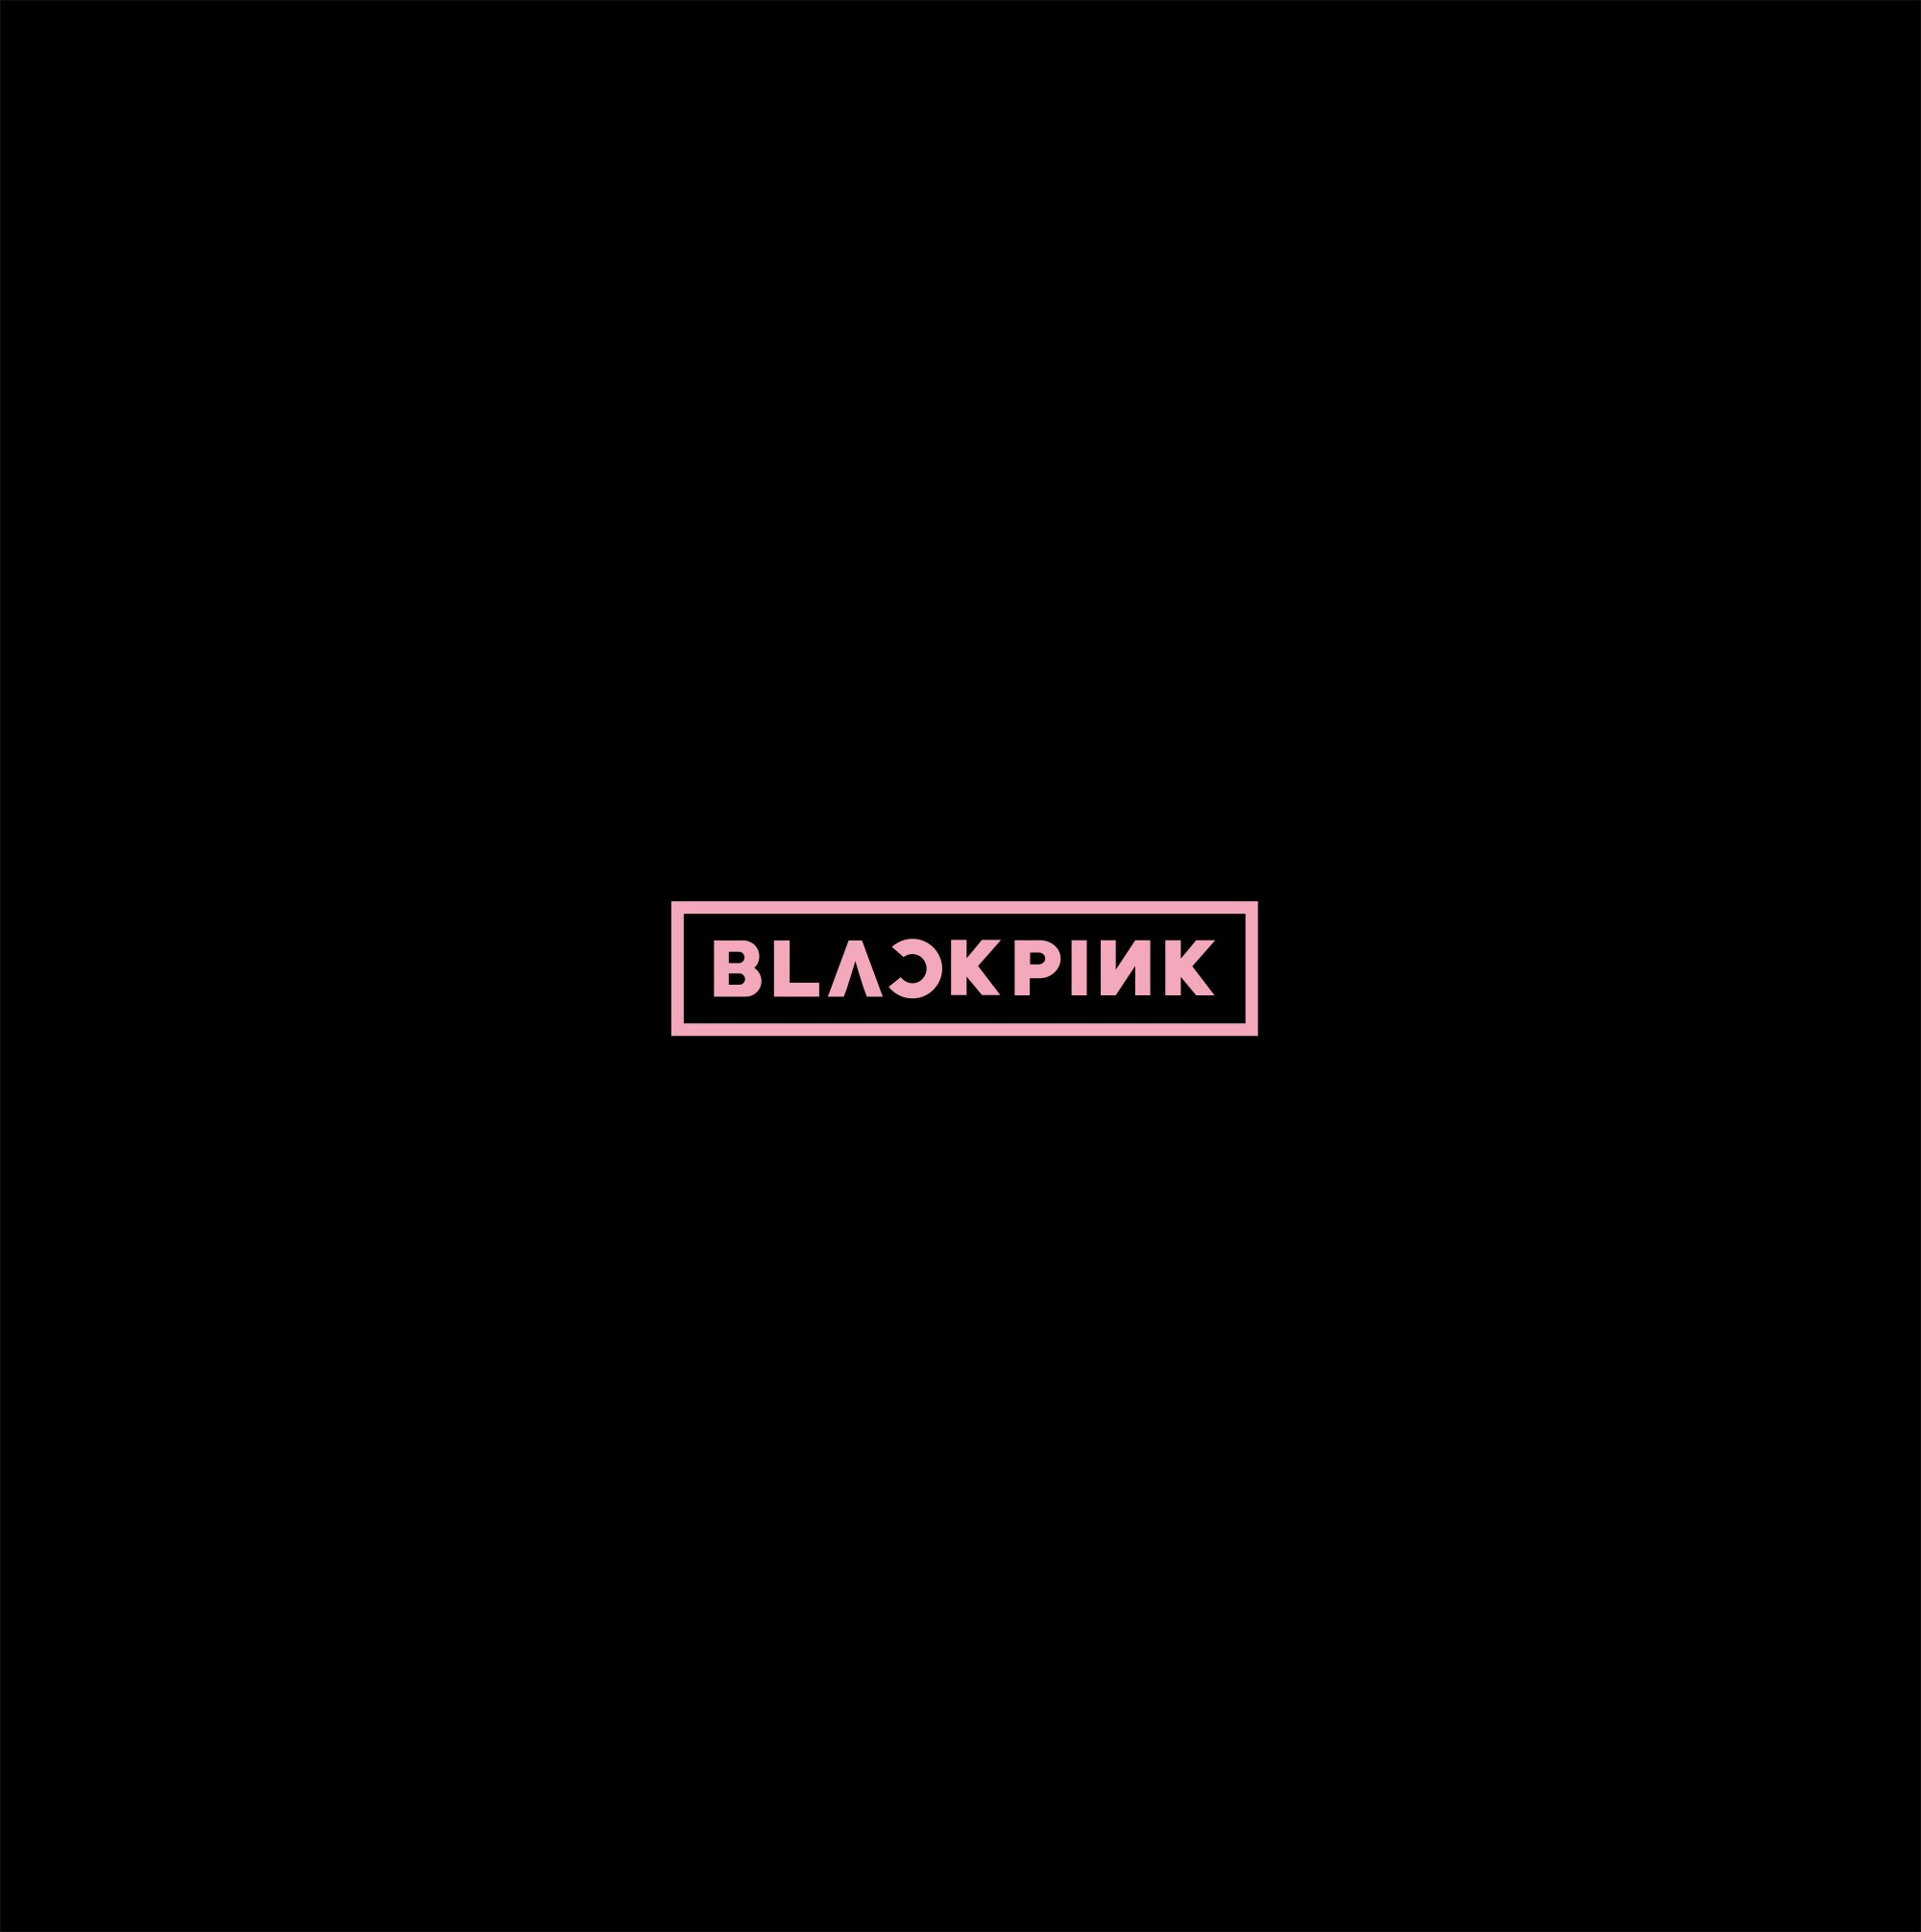 CD : Blackpink - Re: Blackpink (Deluxe Edition, Japan - Import, 2PC)